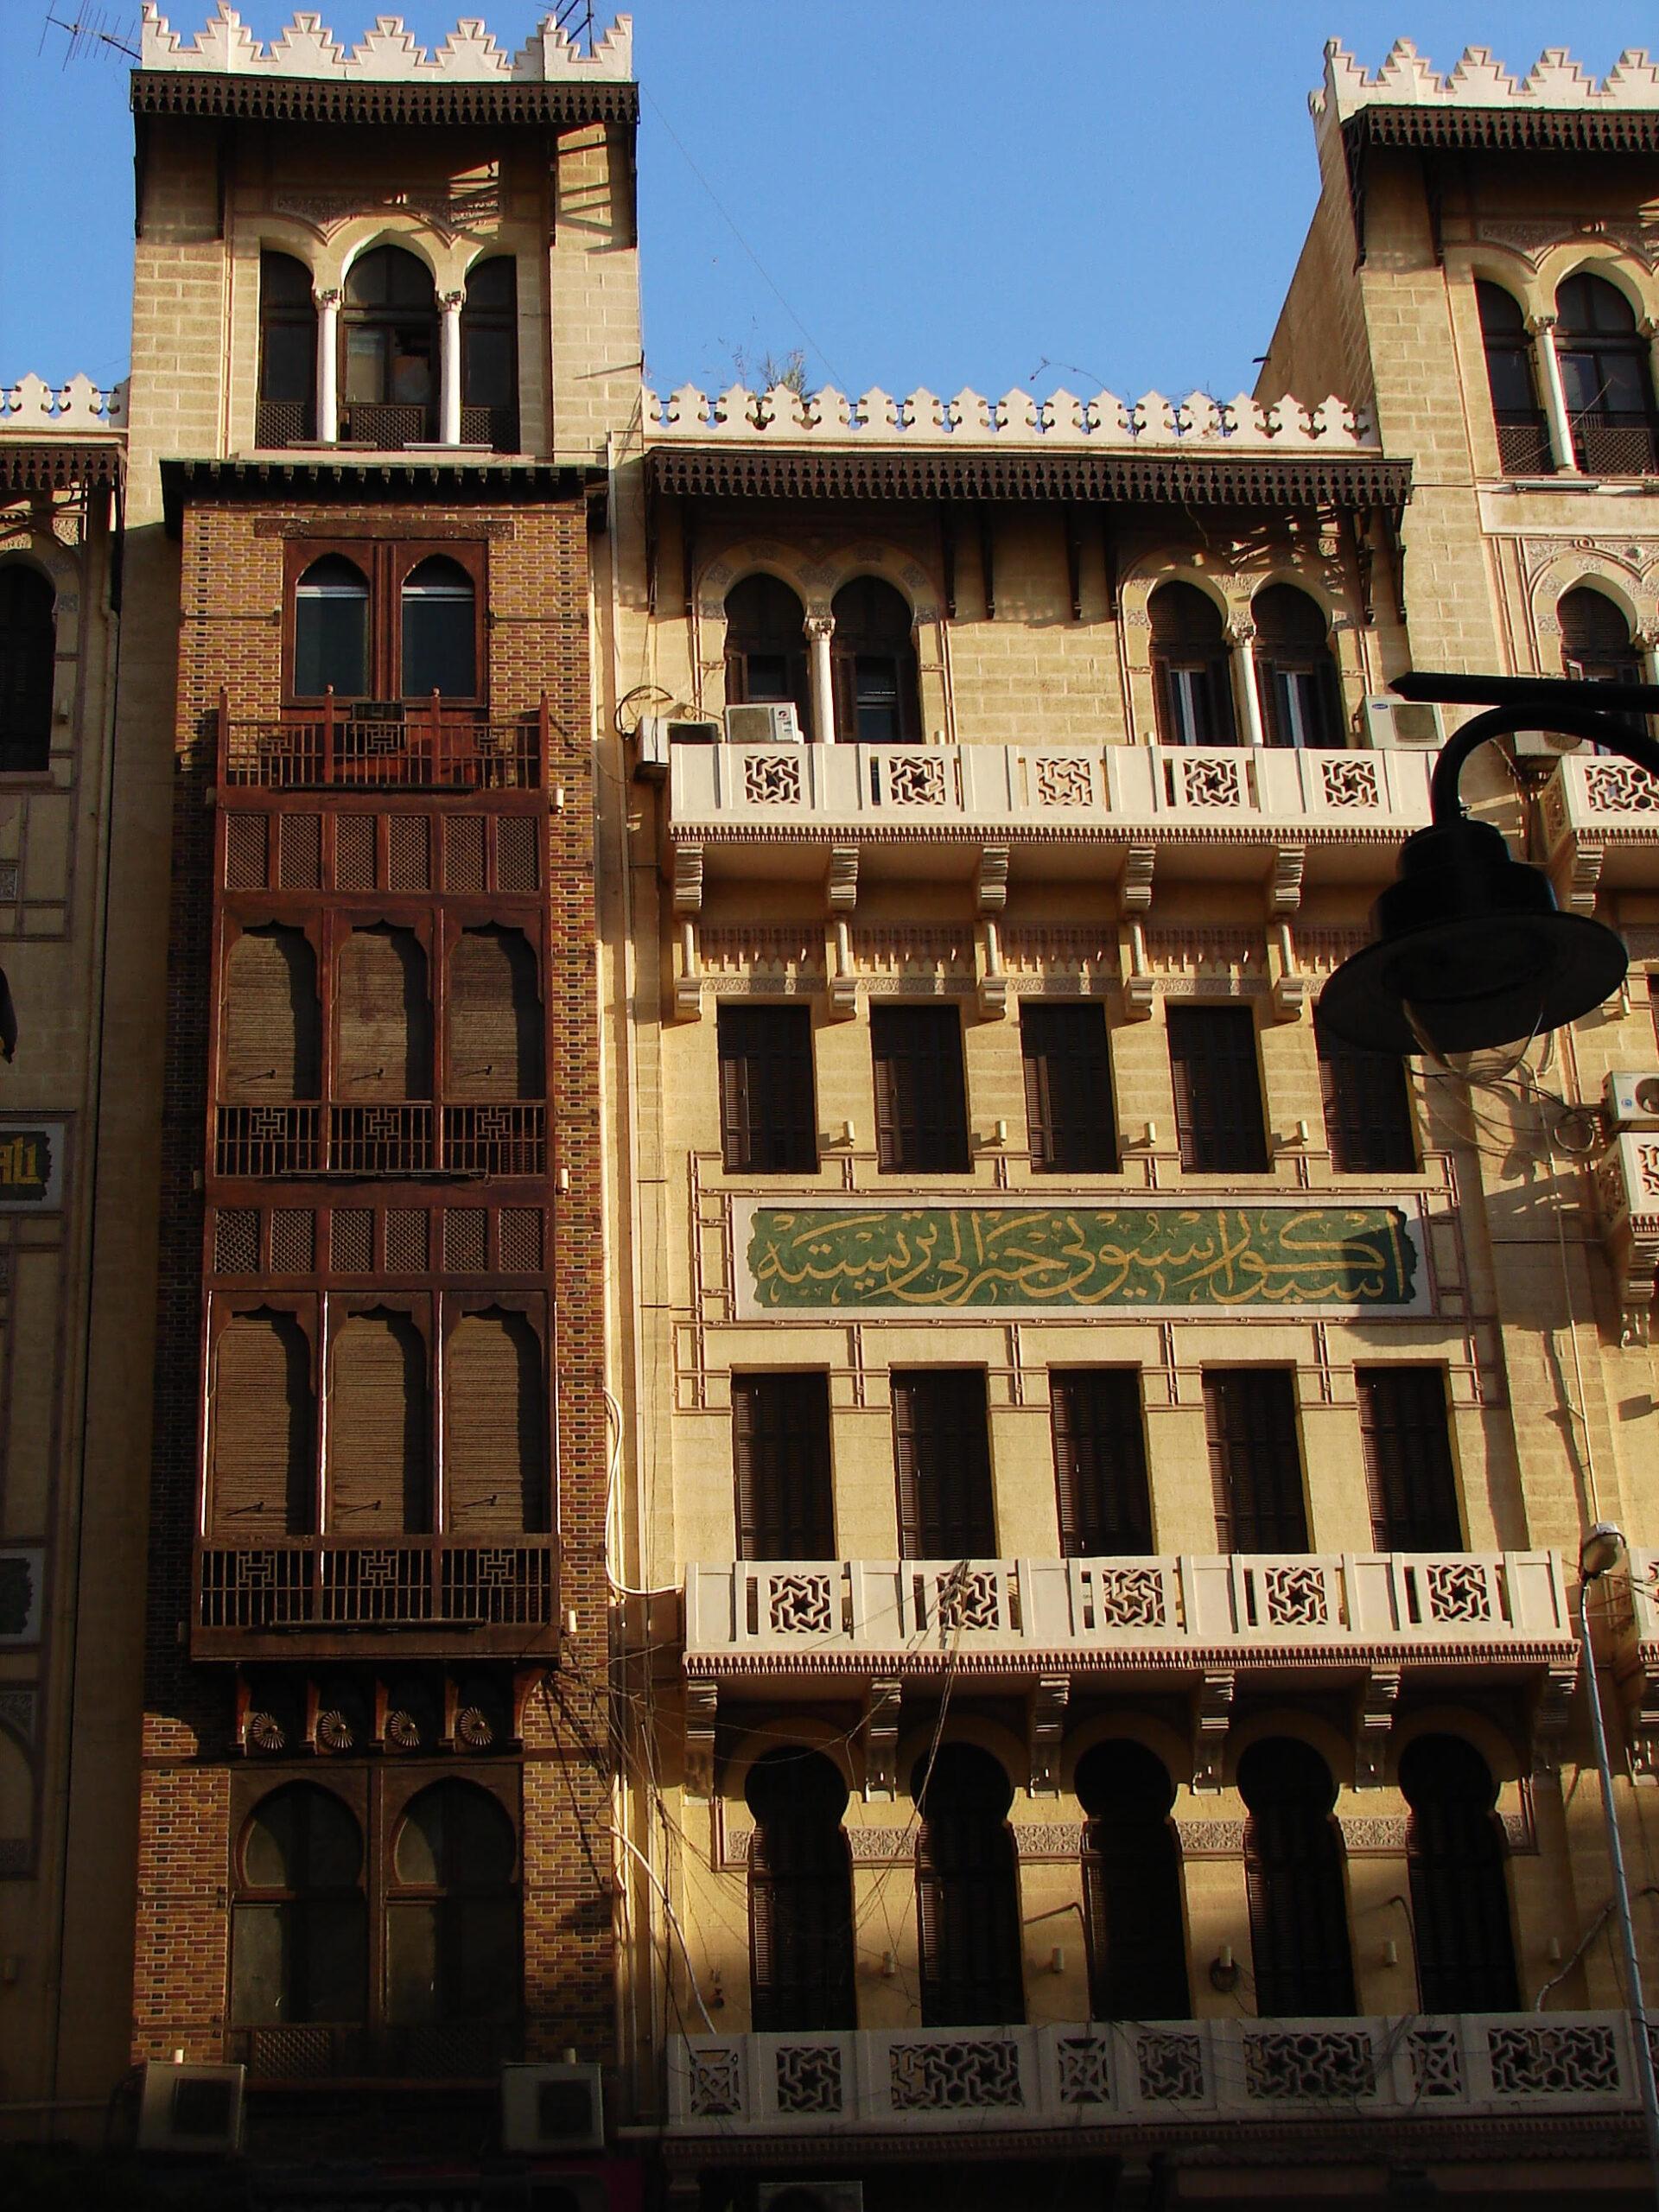 Downtown Cairo: Any hope for regaining past splendour?